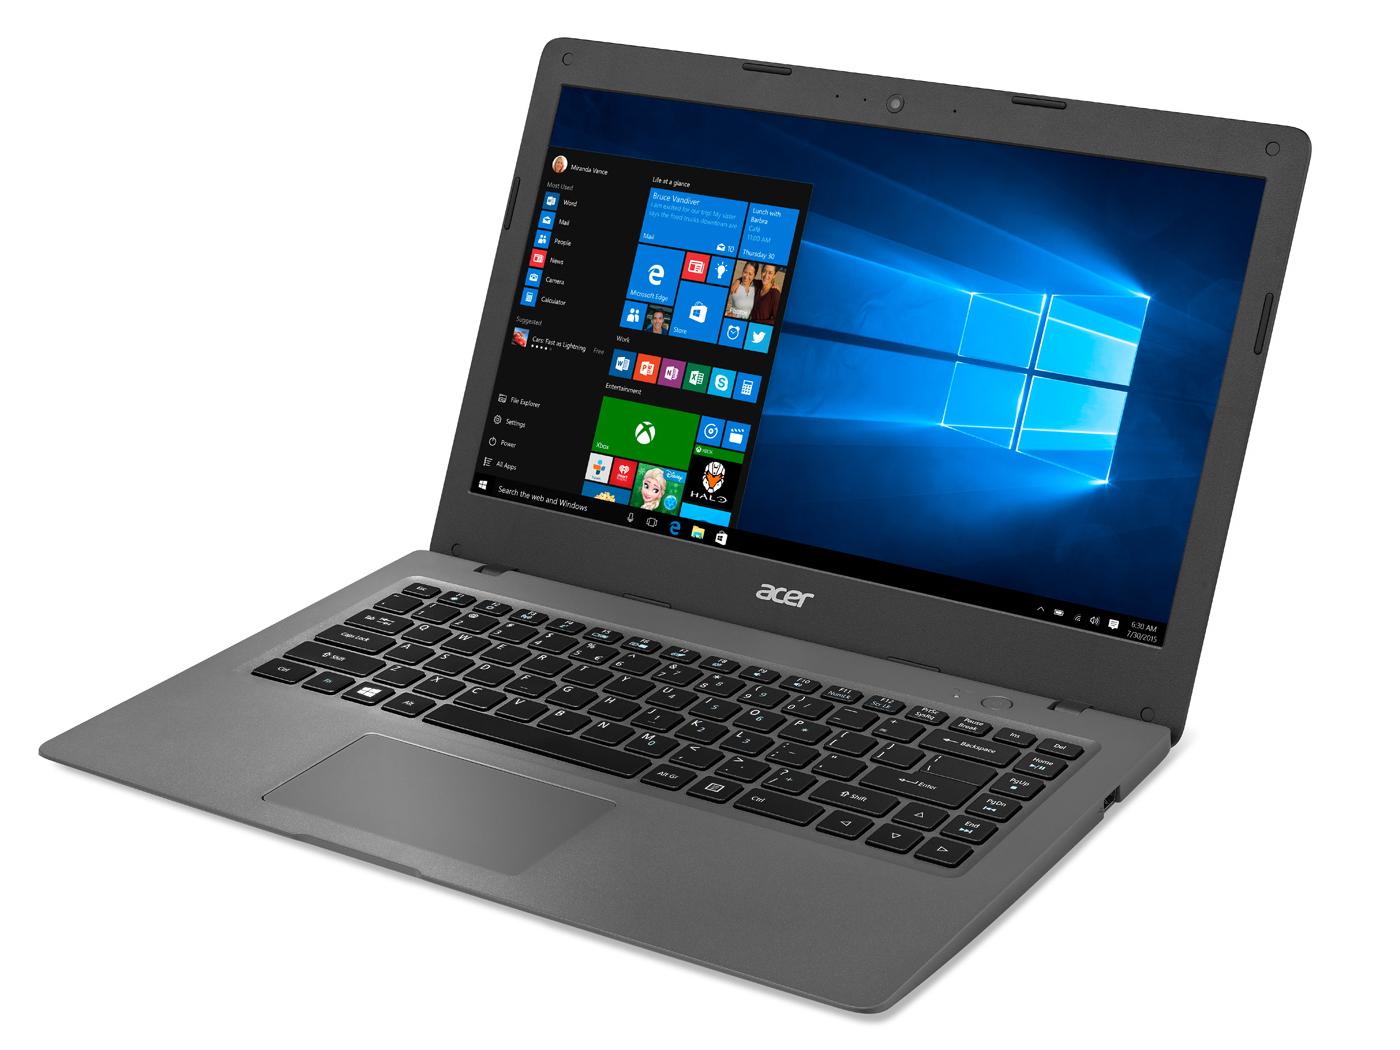 Ноутбук ASUS X756UQ-TY232T 90NB0C31-M02550 (Intel Core i5-6200U 2.3 GHz/4096Mb/1000Gb/DVD-RW/nVidia GeForce 940MX 2048Mb/Wi-Fi/Bluetooth/Cam/17.3/1600x900/Windows 10 64-bit)